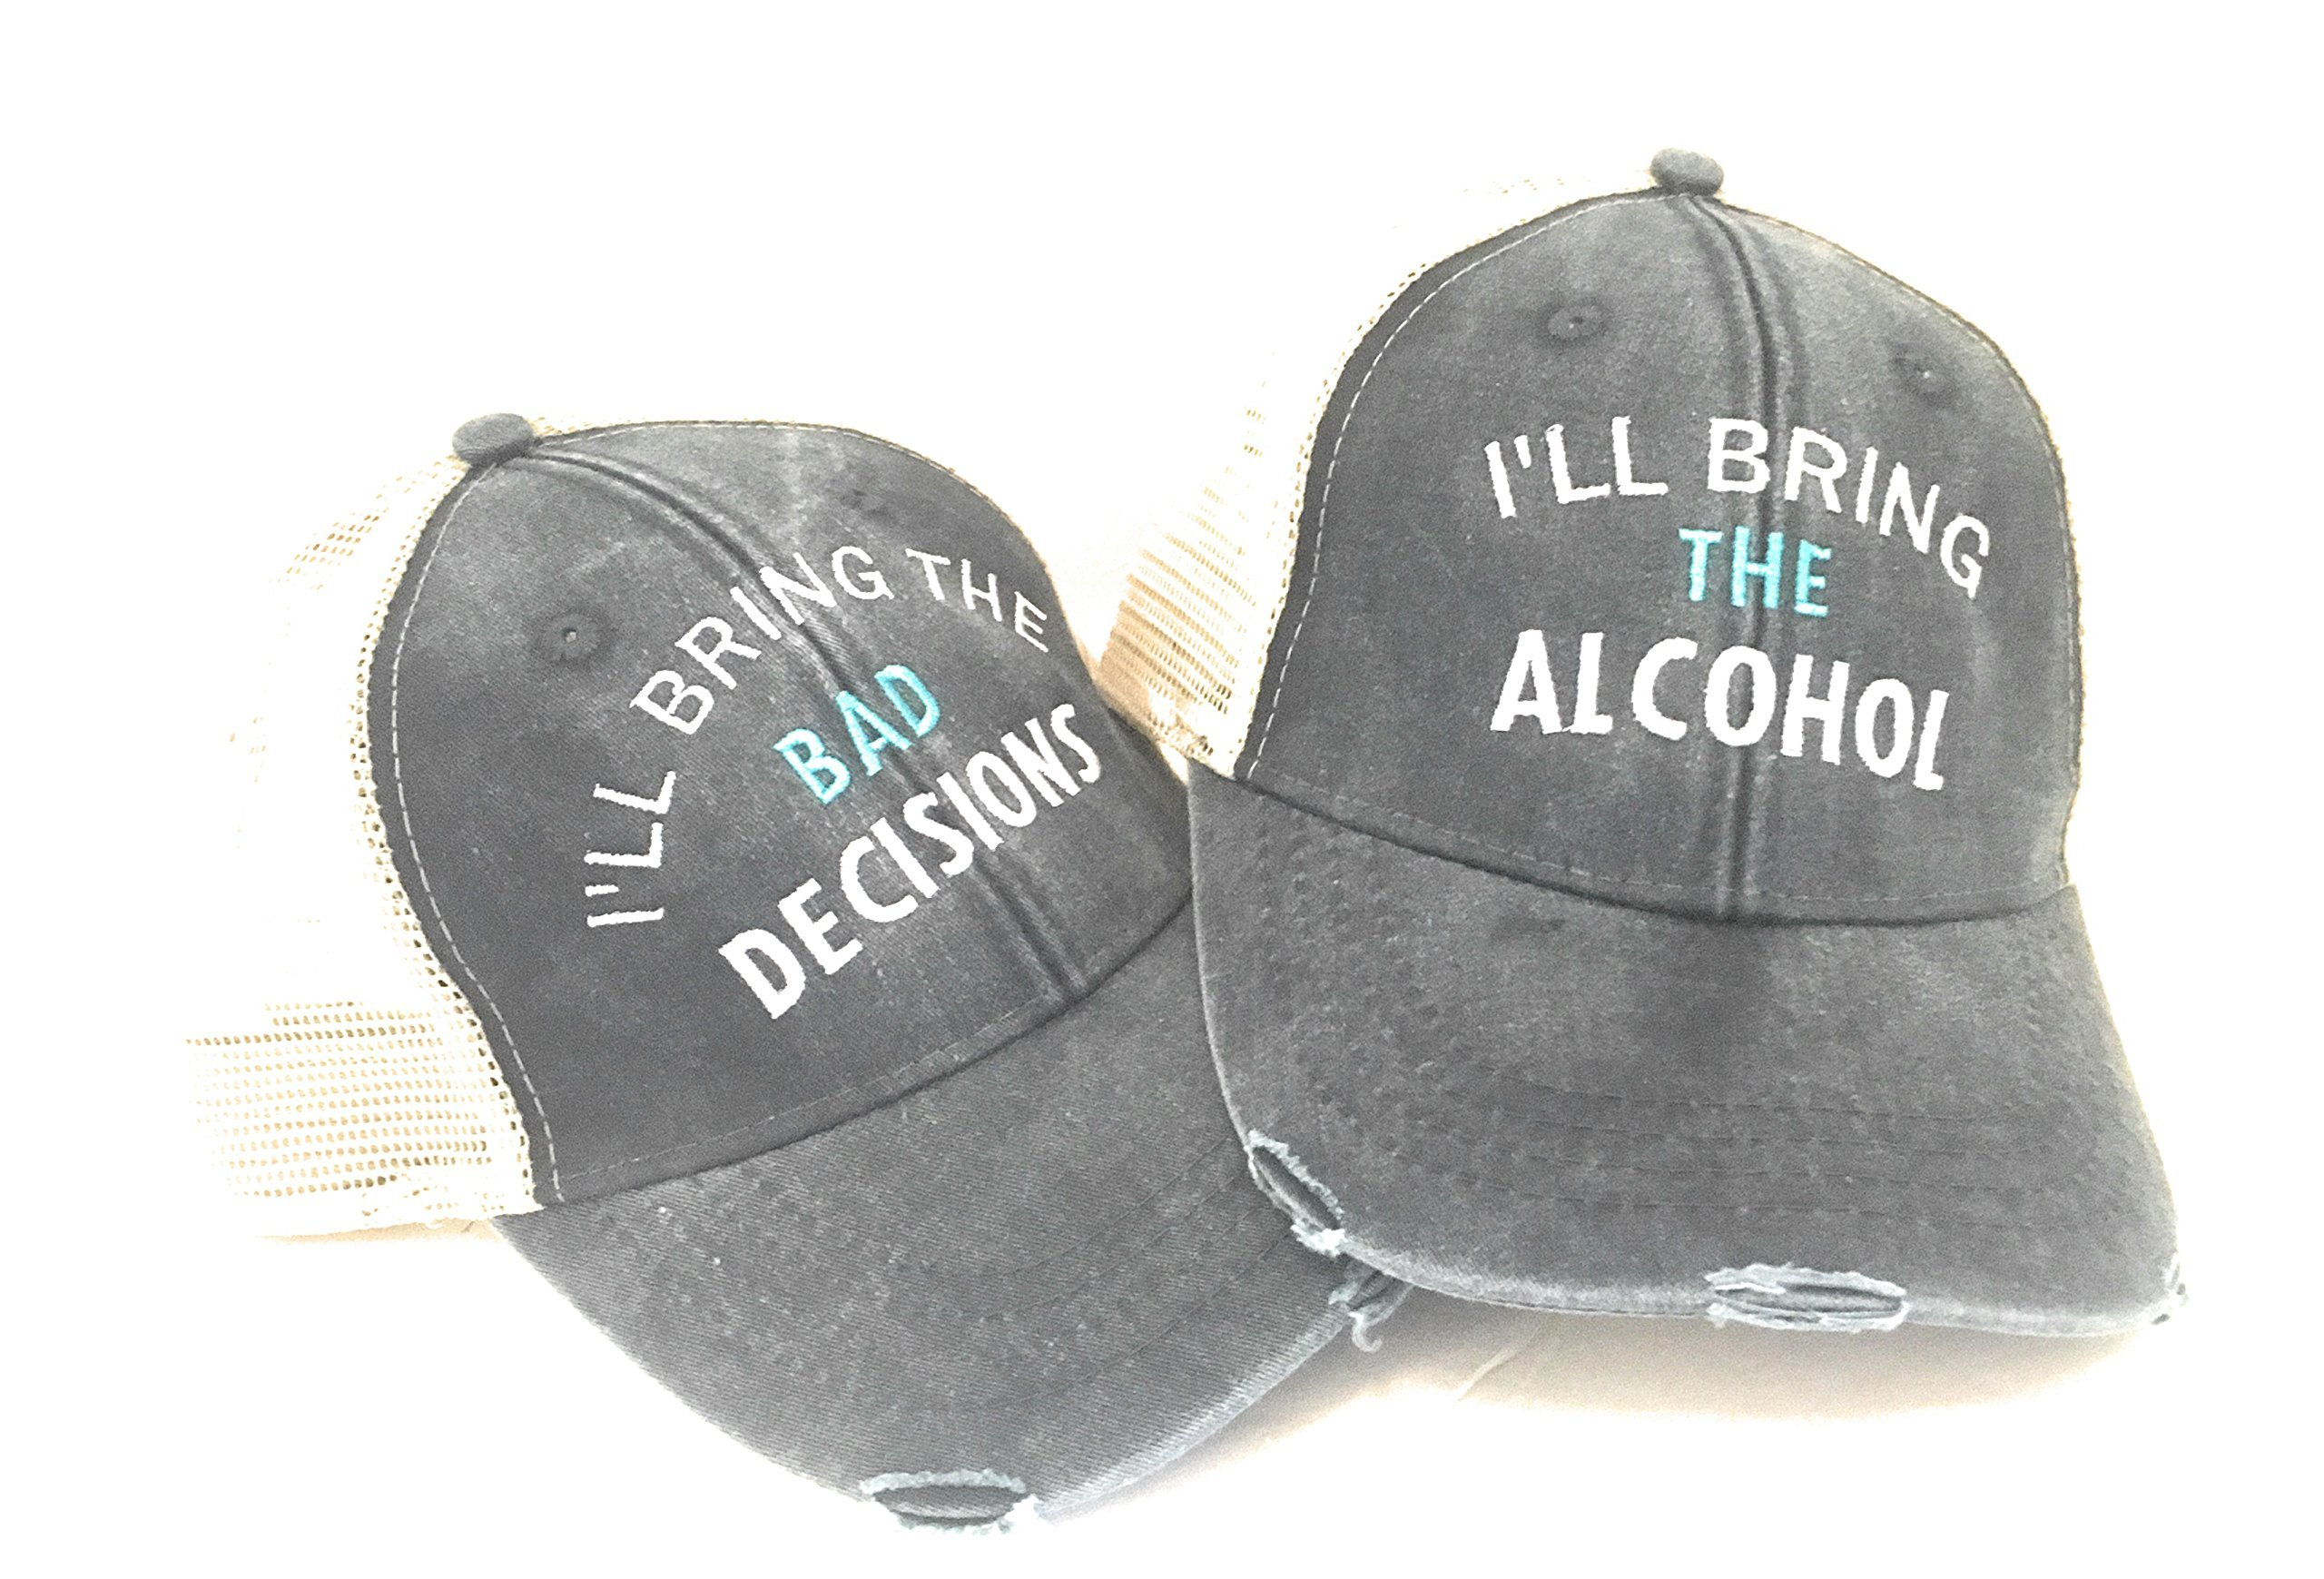 I'll Bring The Bad Decision/ Alcohol Baseball Hats Set of 2